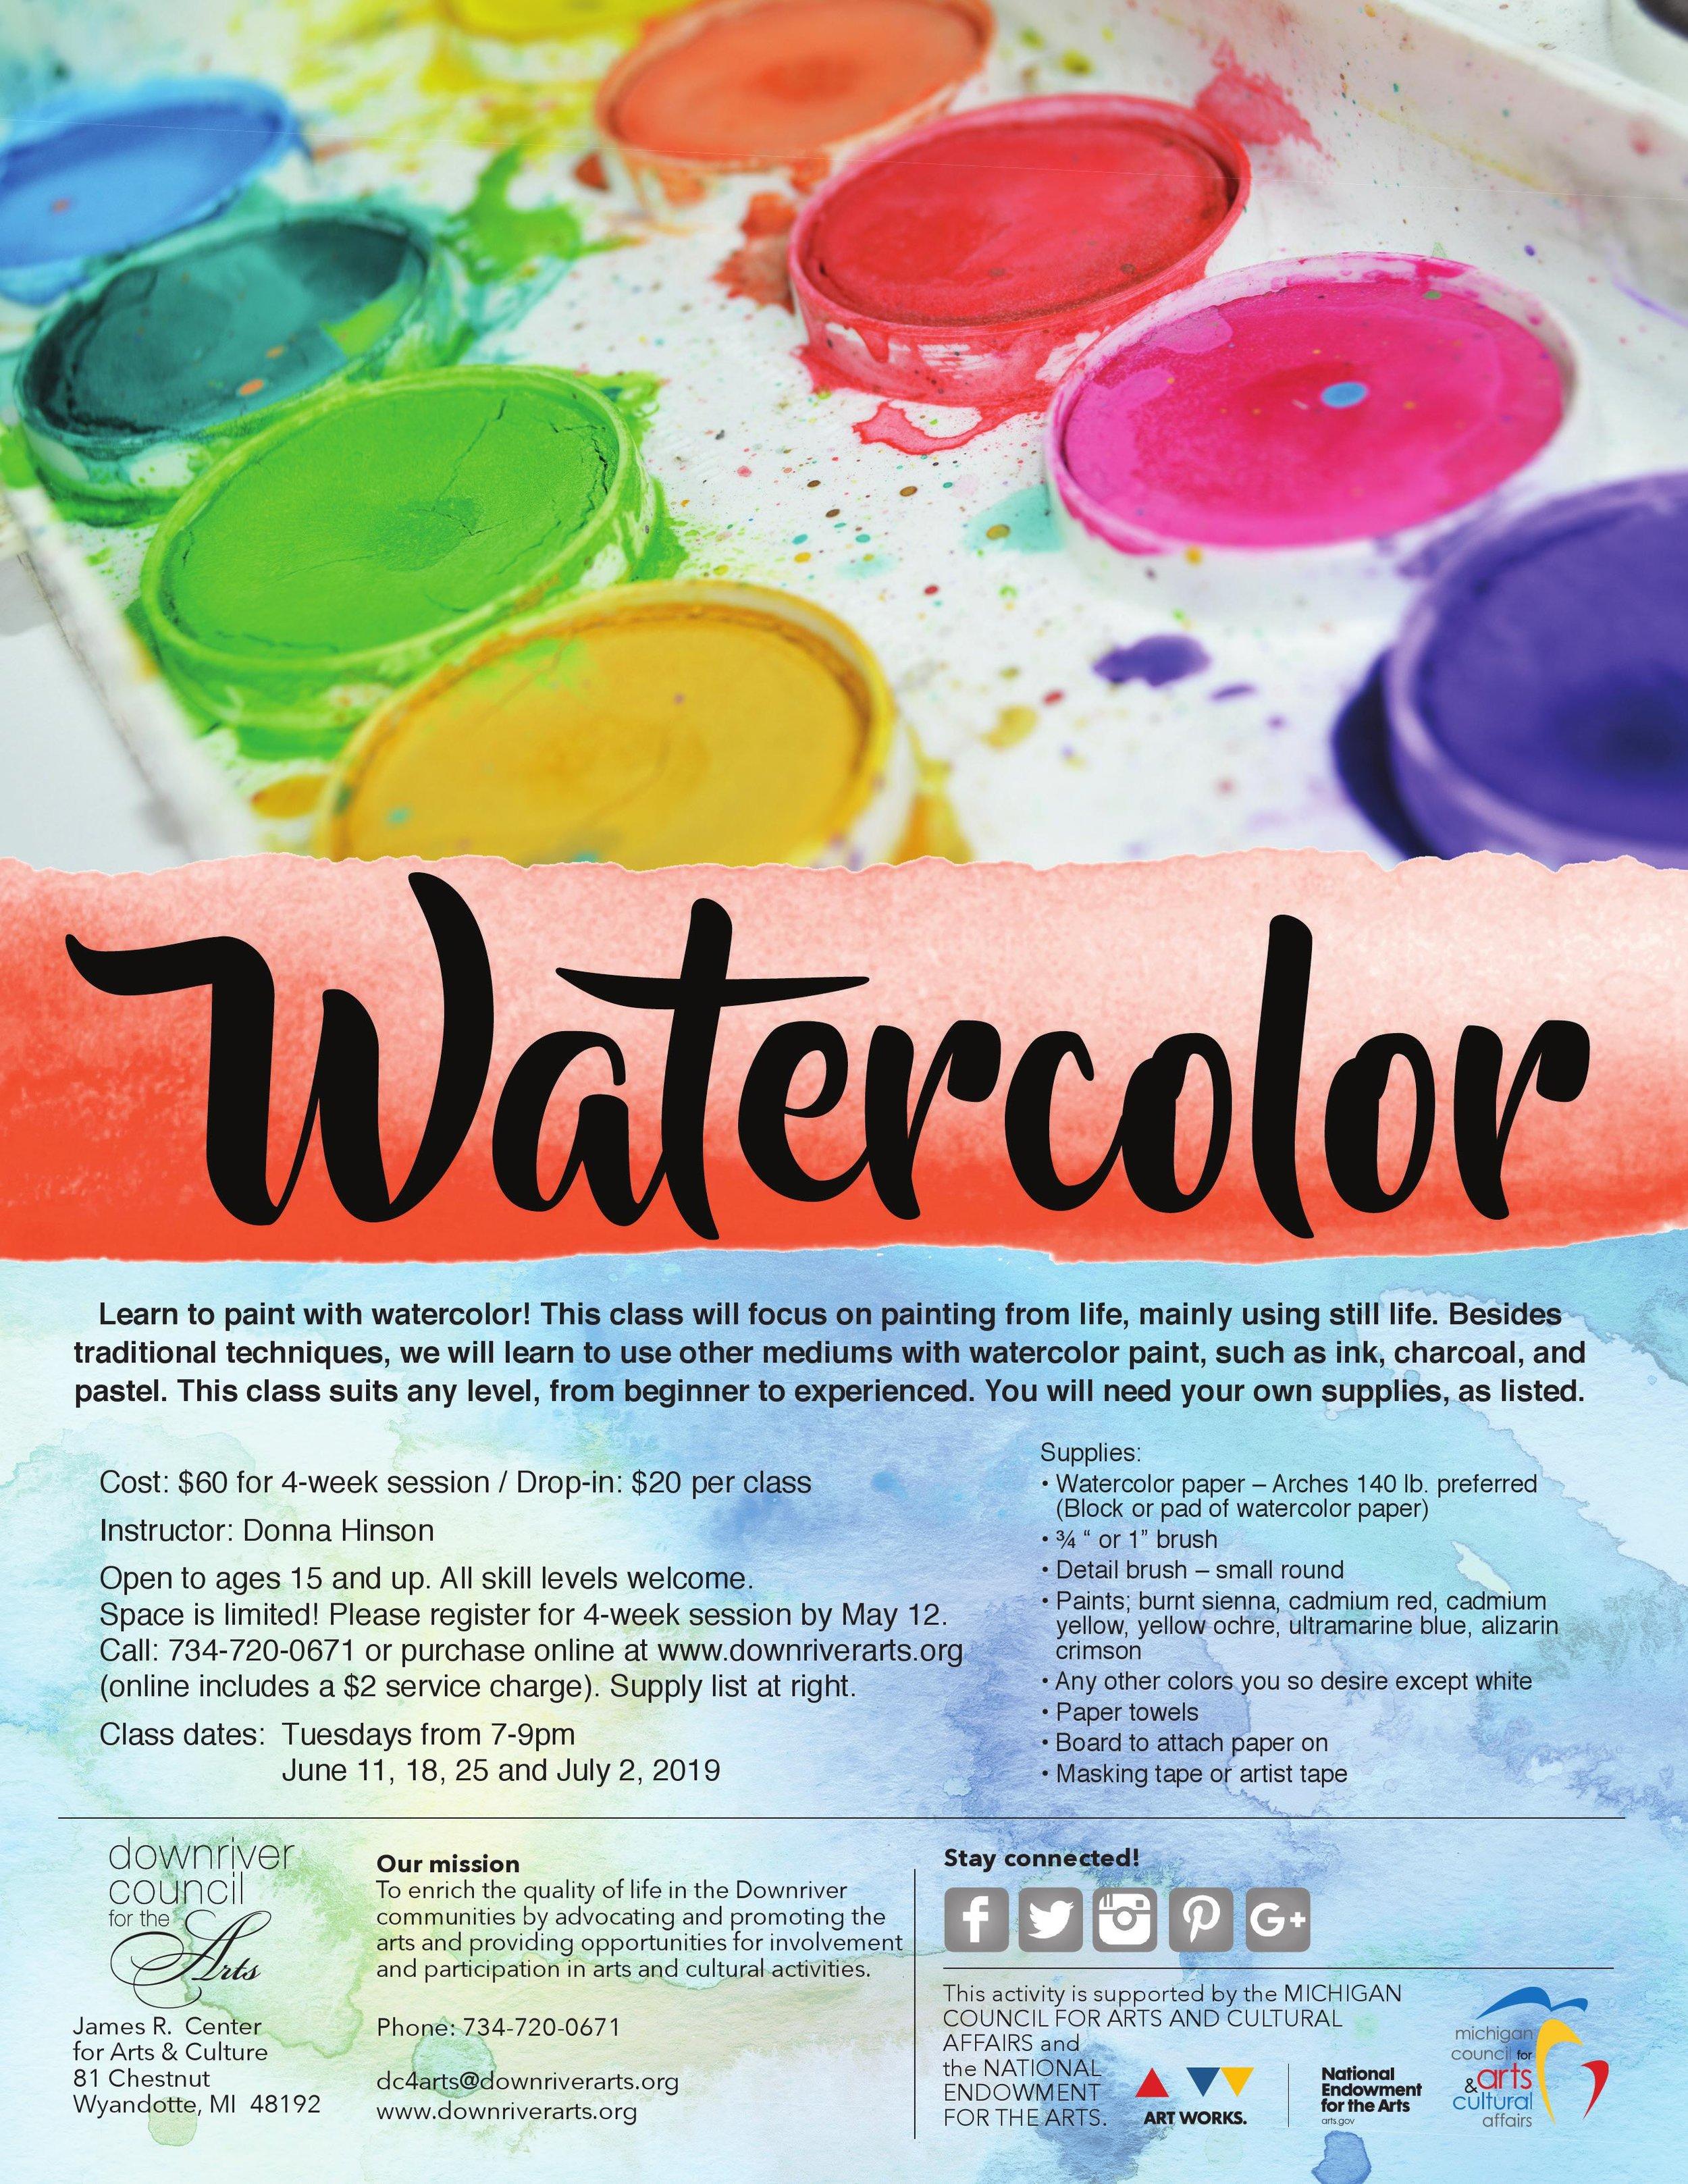 Watercolor 0619-85x11_00001.jpg